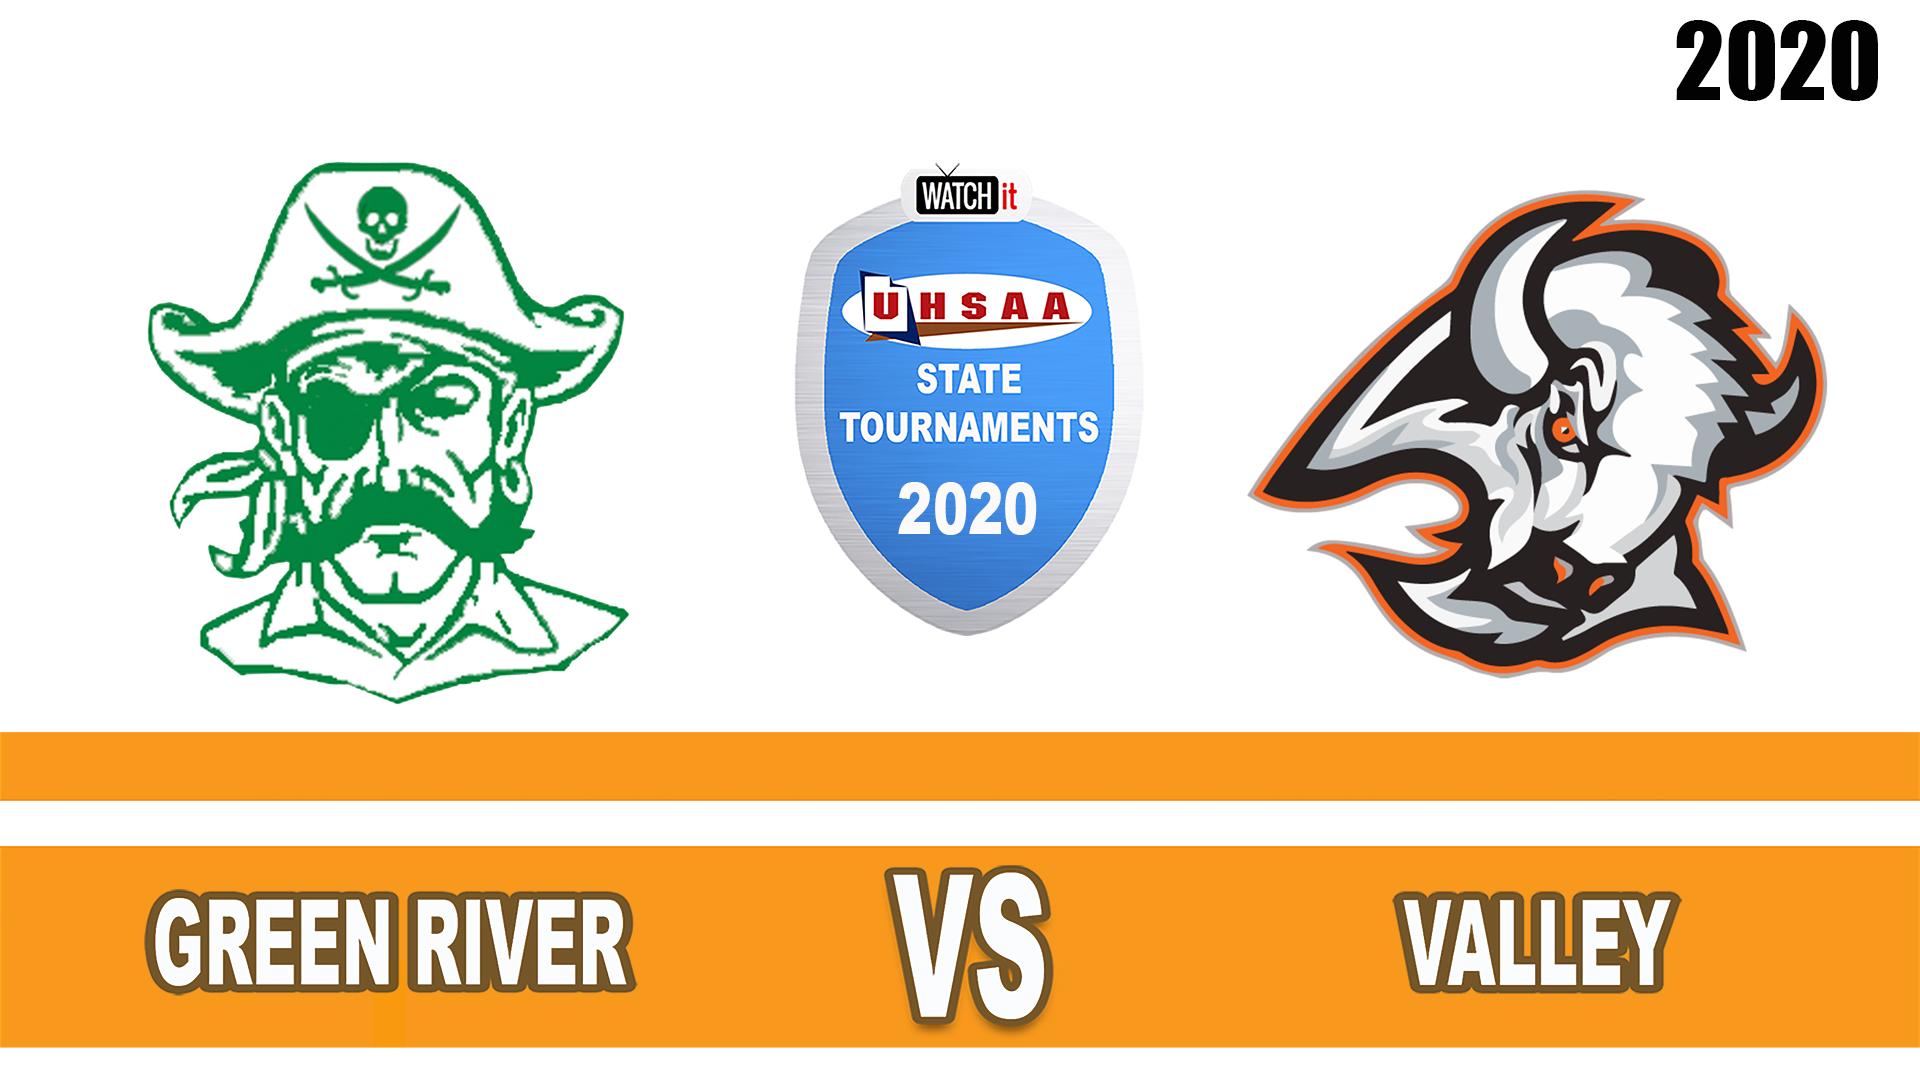 Green River vs Valley